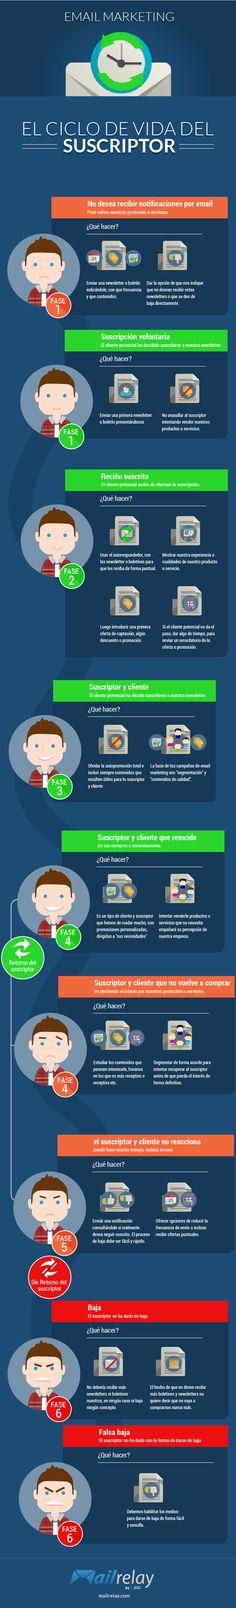 Email marketing: el ciclo de vida del suscriptor #infografia #infographic #marketing